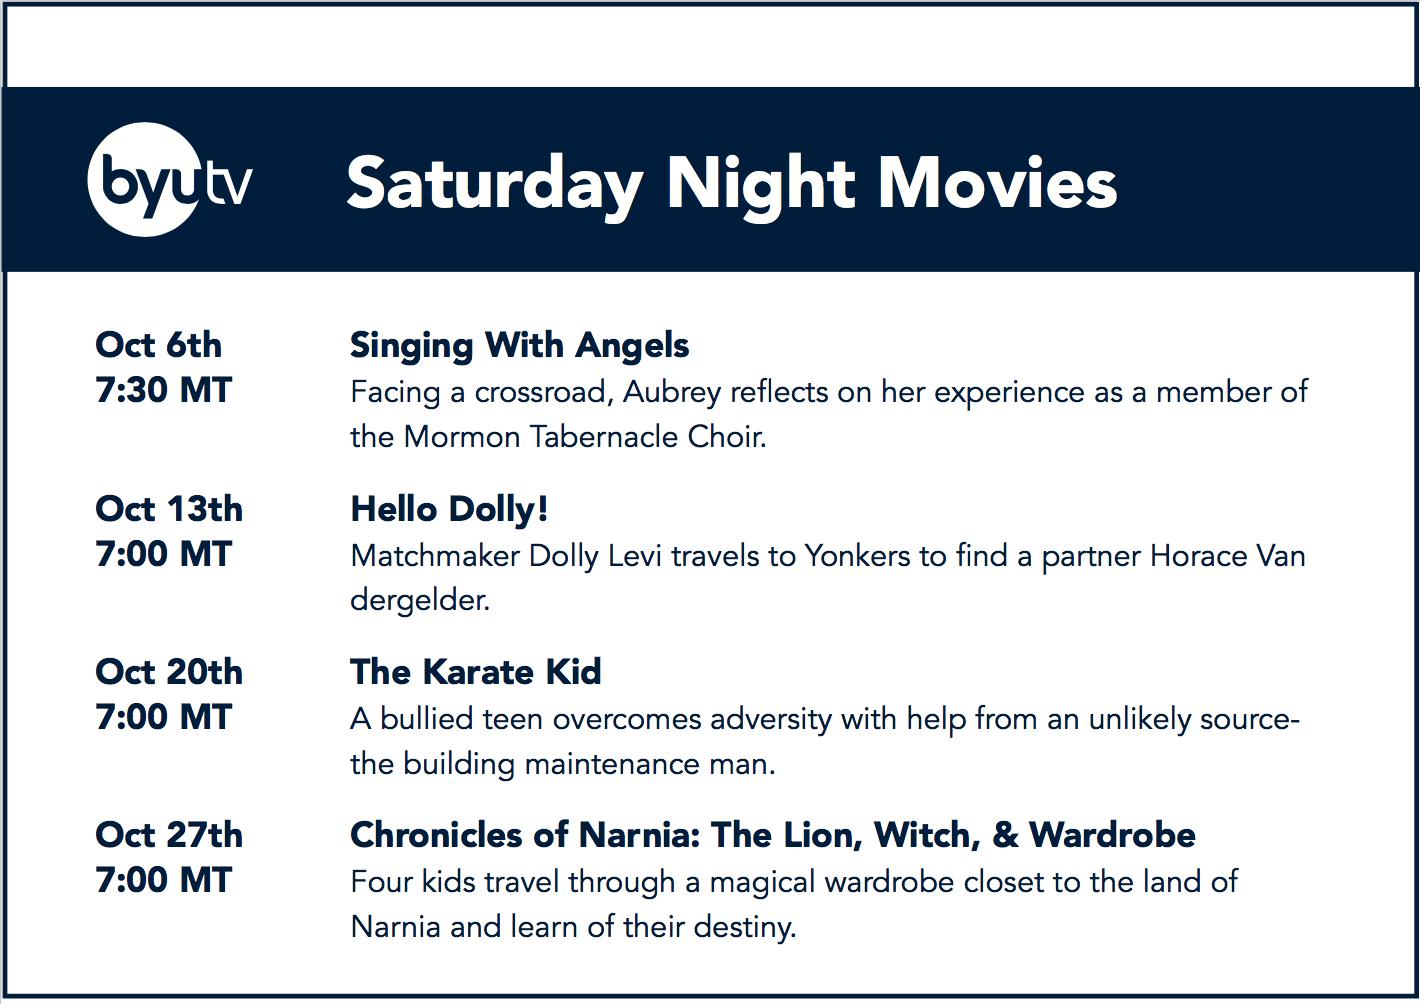 Family Movies in October - BYUtv